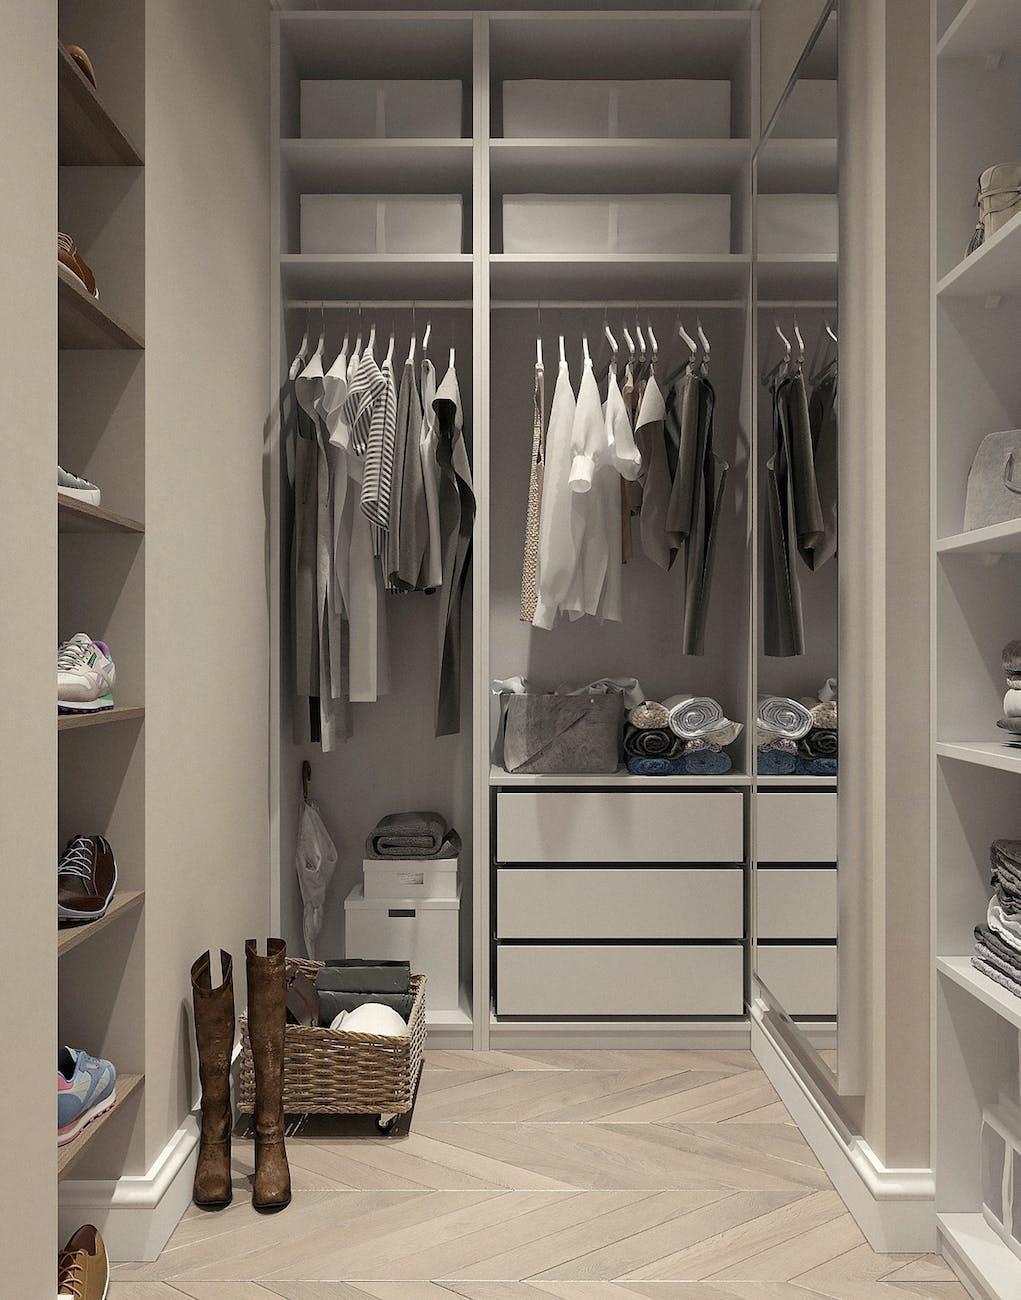 Walk in closet floors to clean.